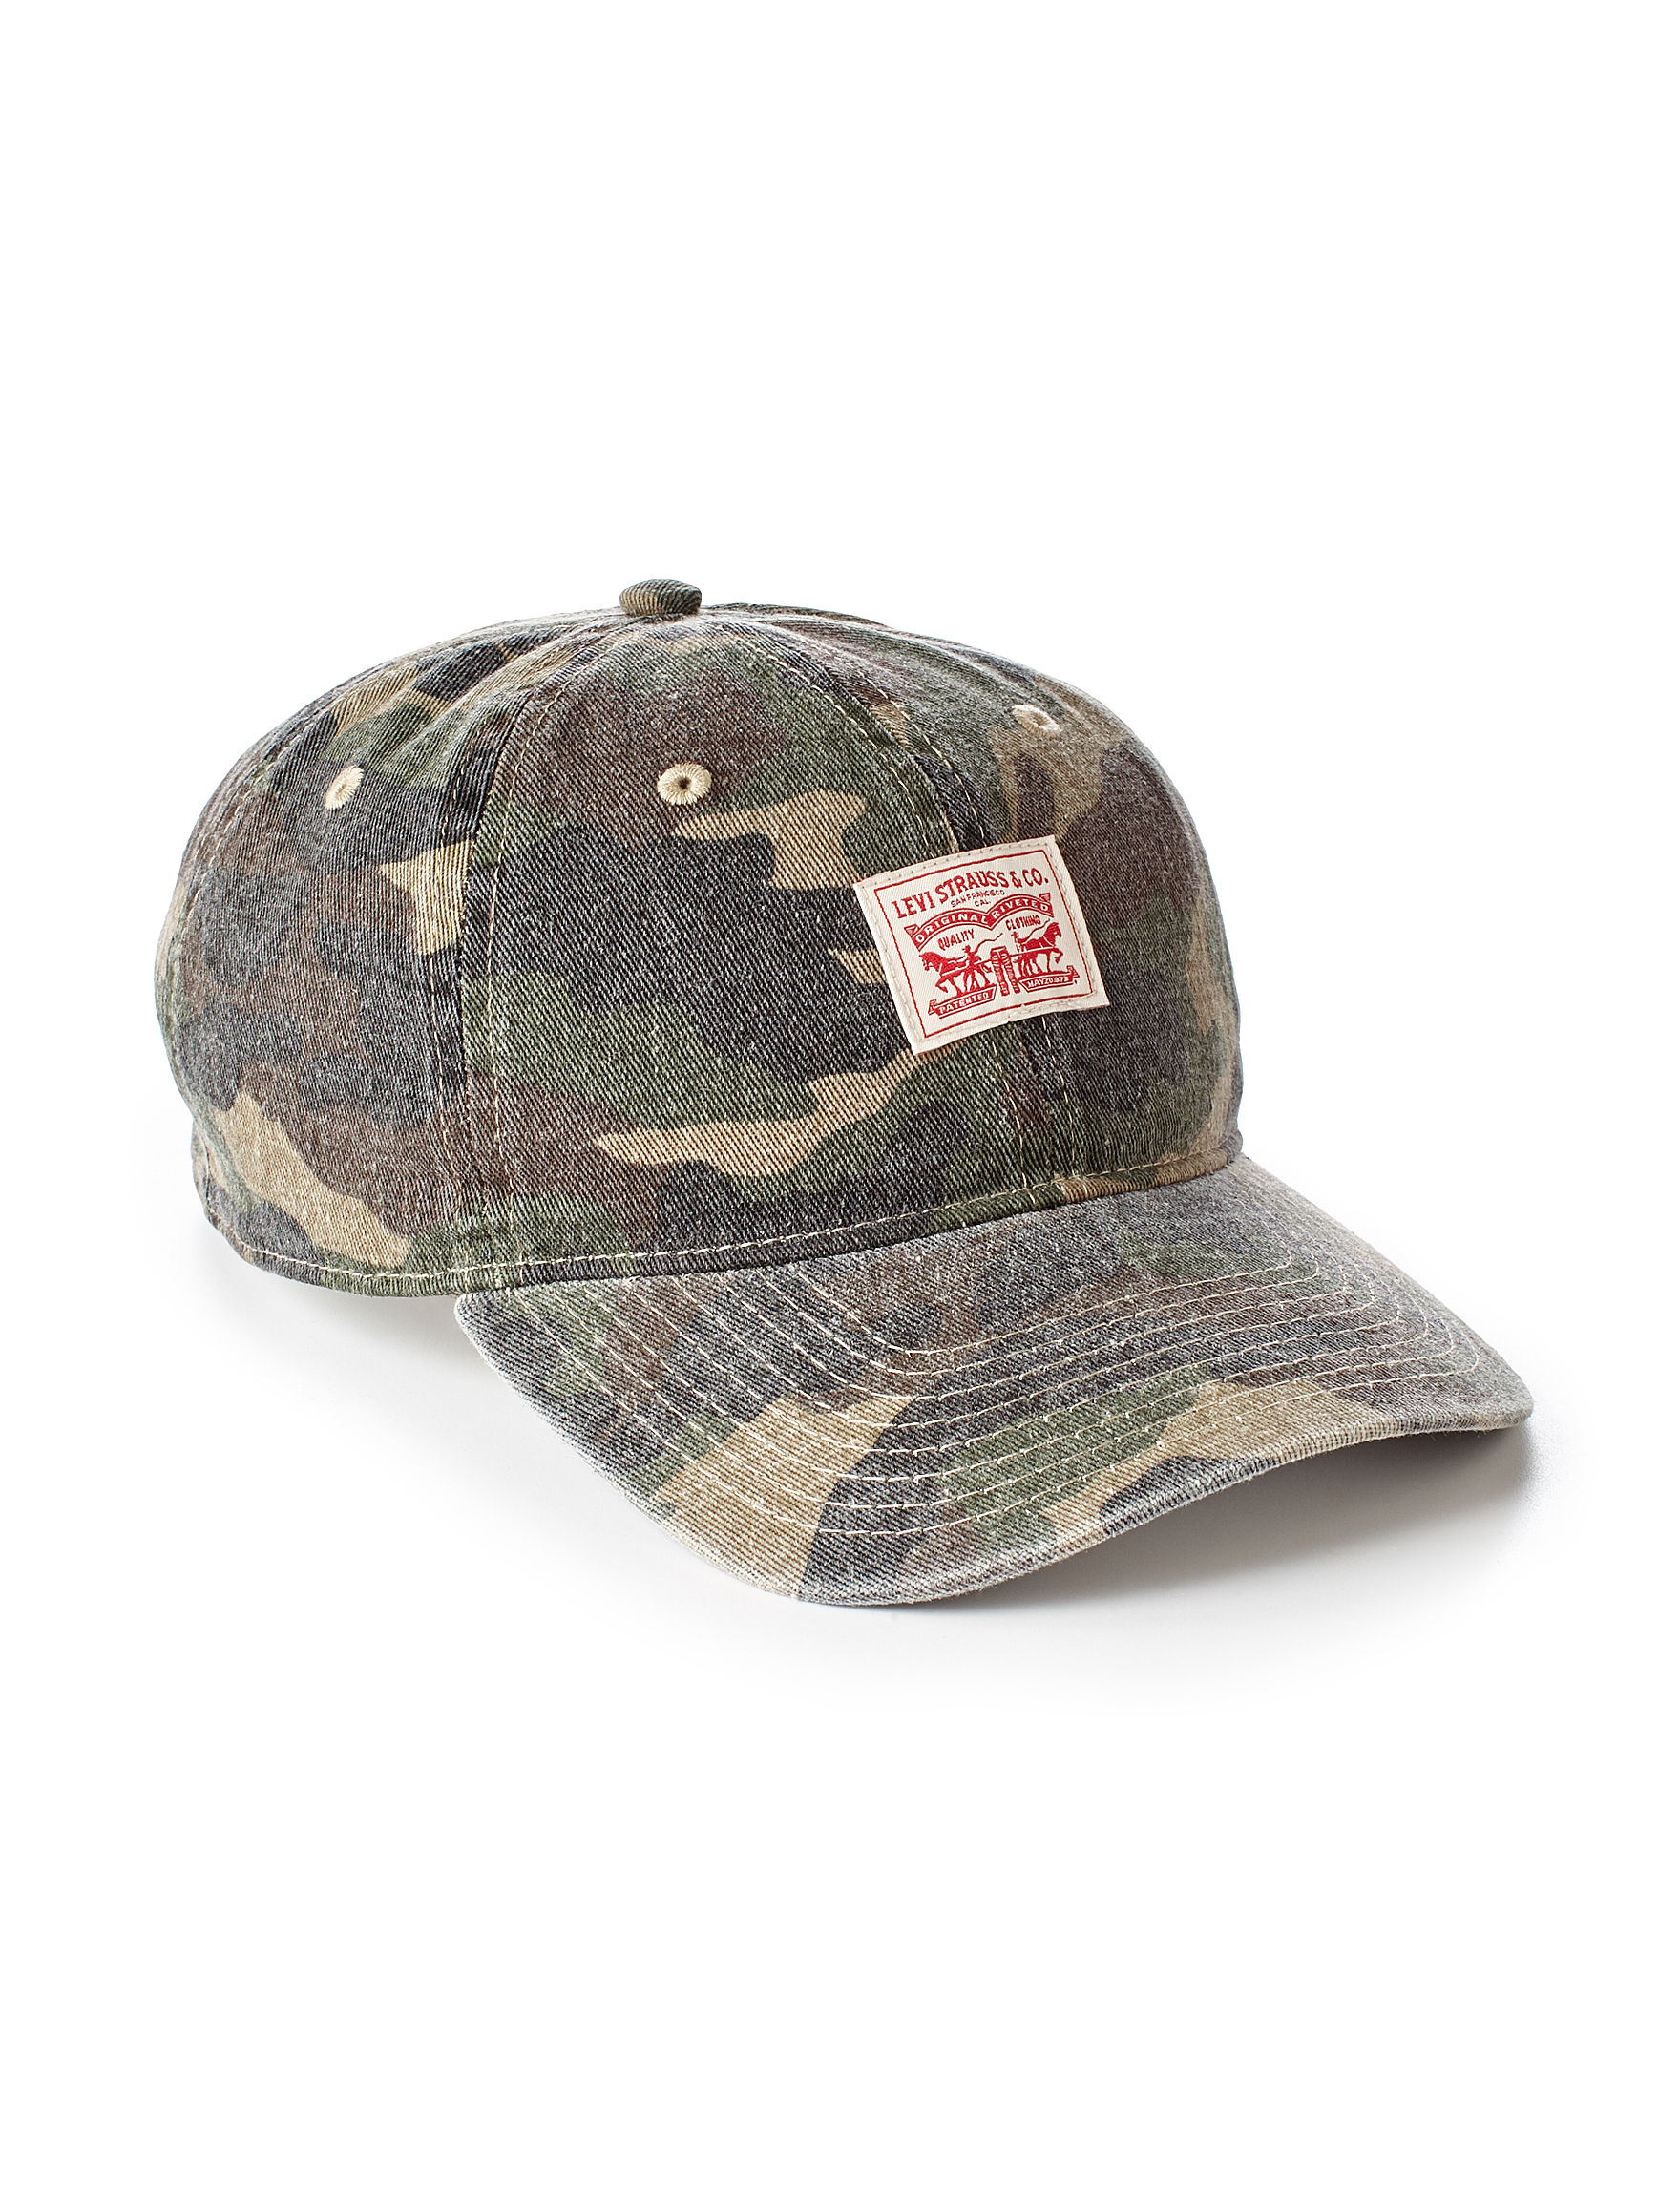 Levi's Camo Hats & Headwear